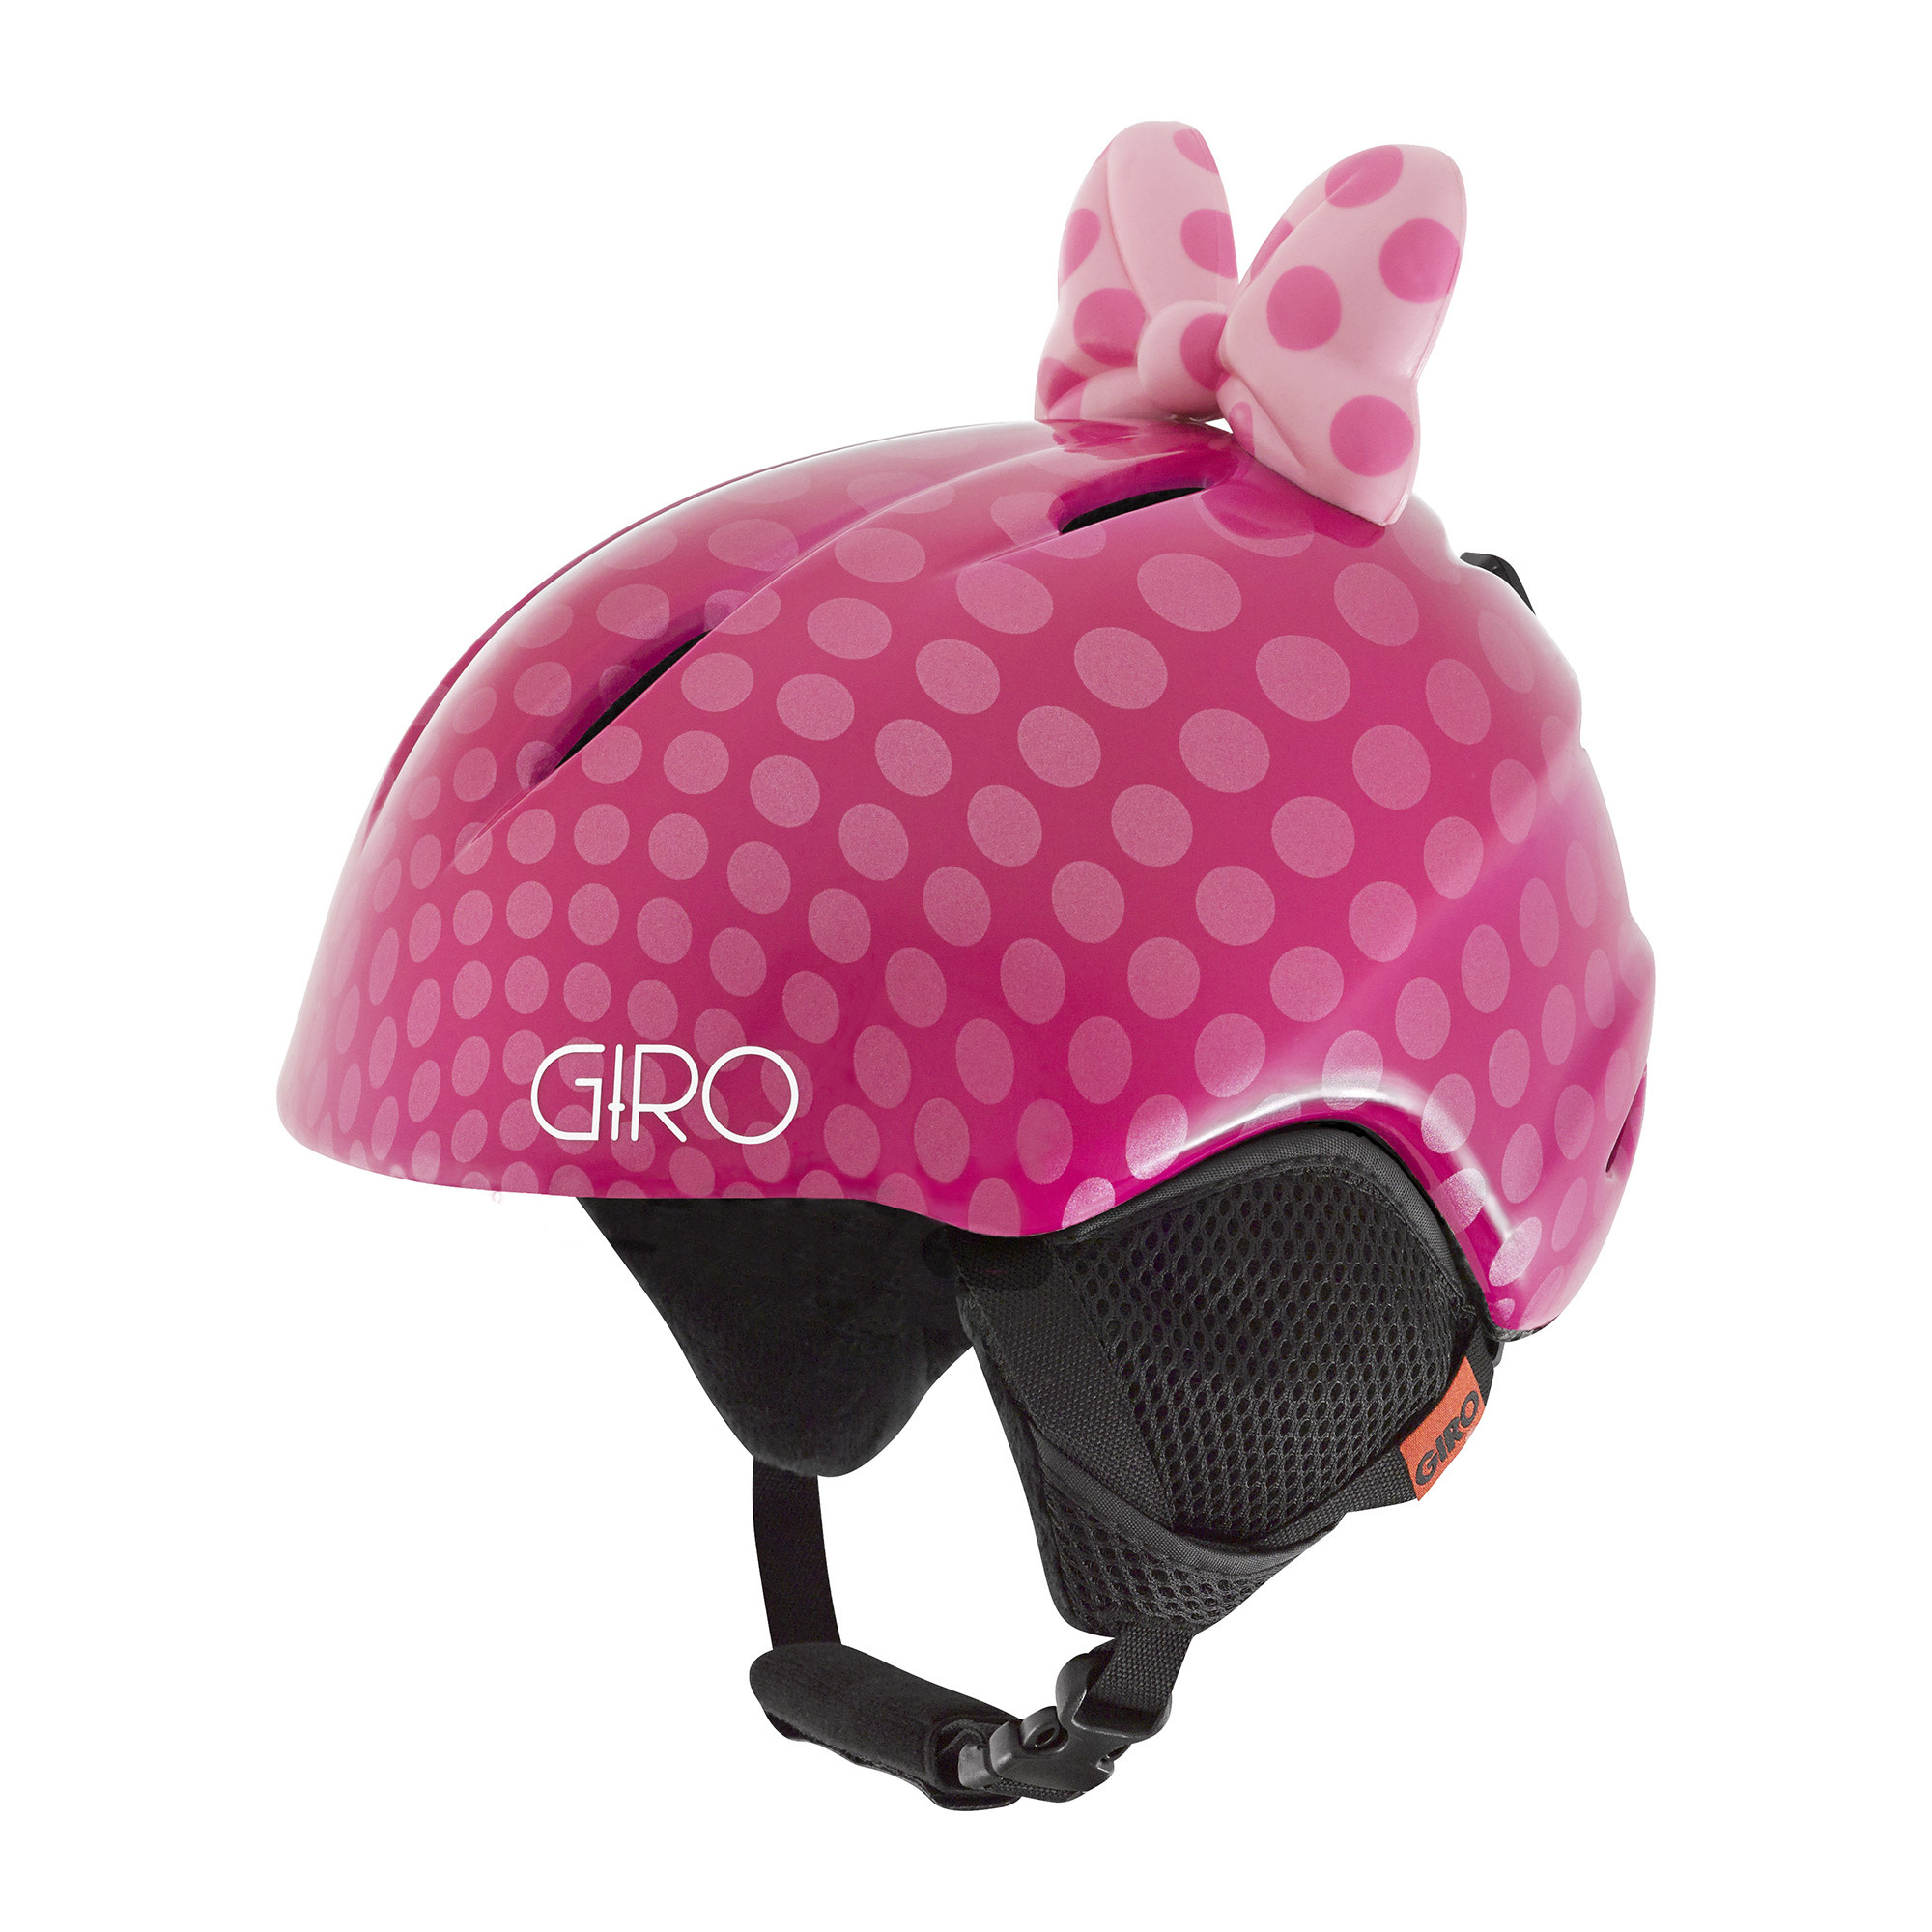 Giro Launch Plus-1